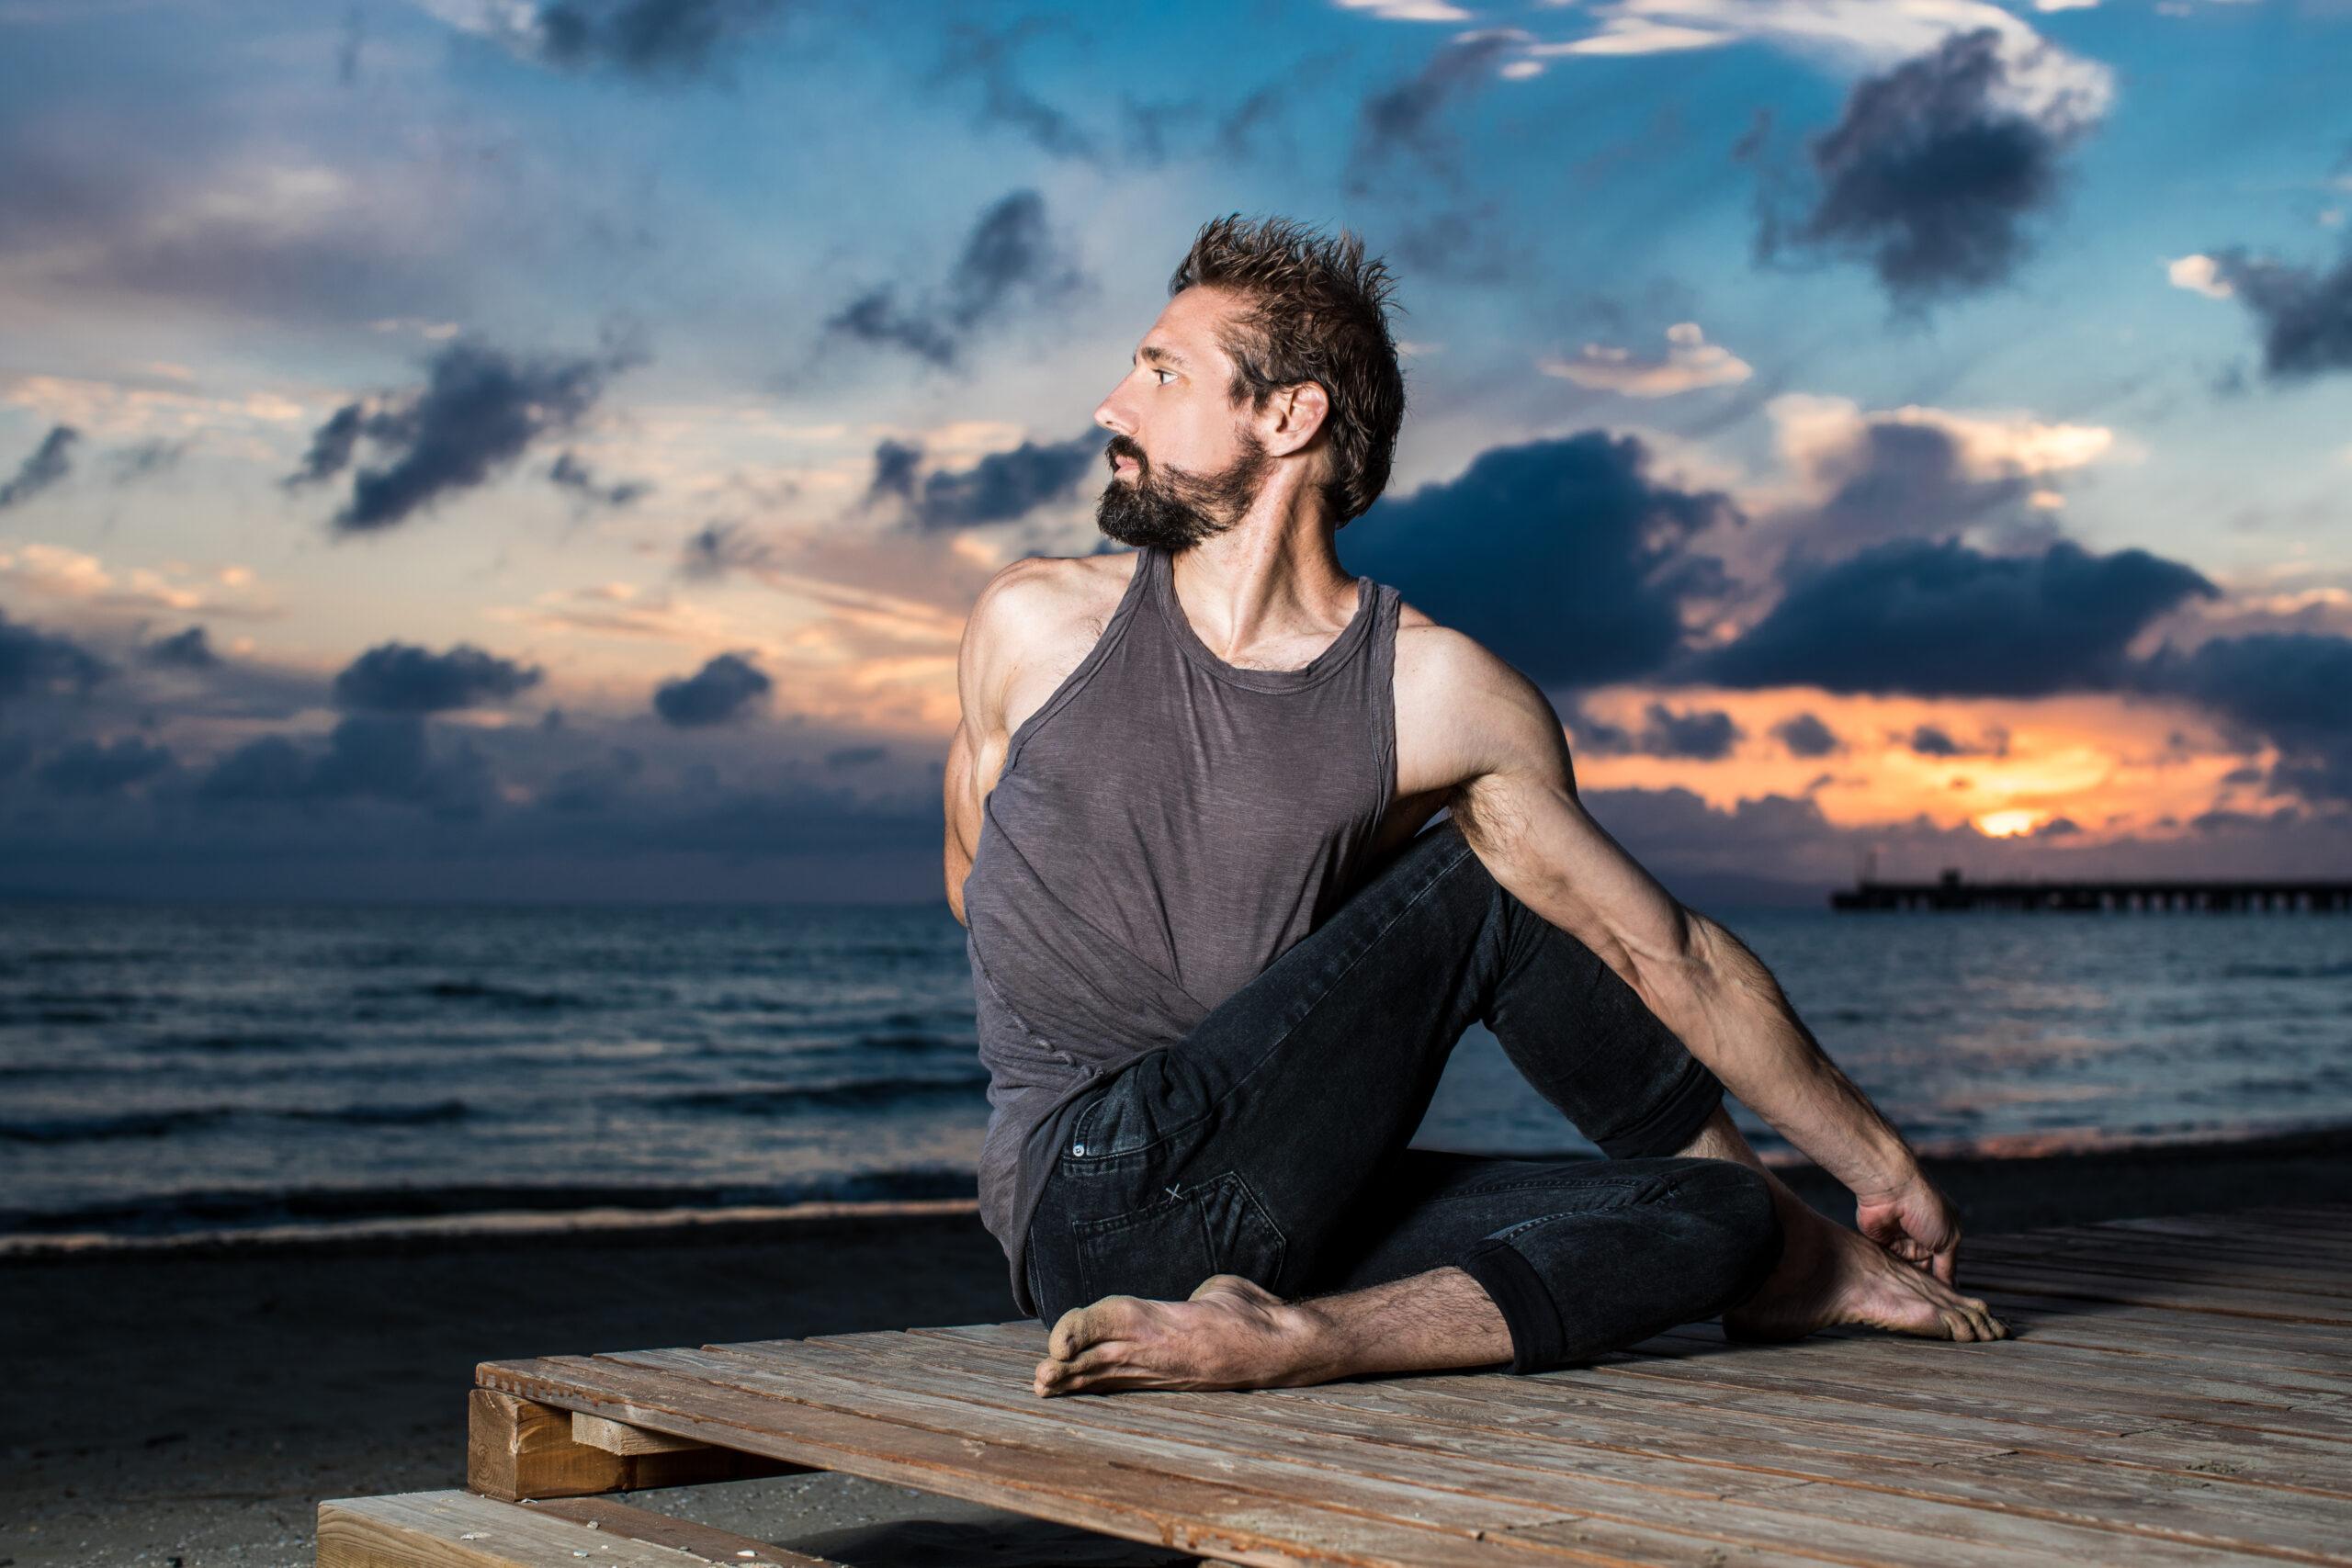 Yoga Pose Tutorial: Ardha Matsyendrasana or Half Lord of the Fishes Pose